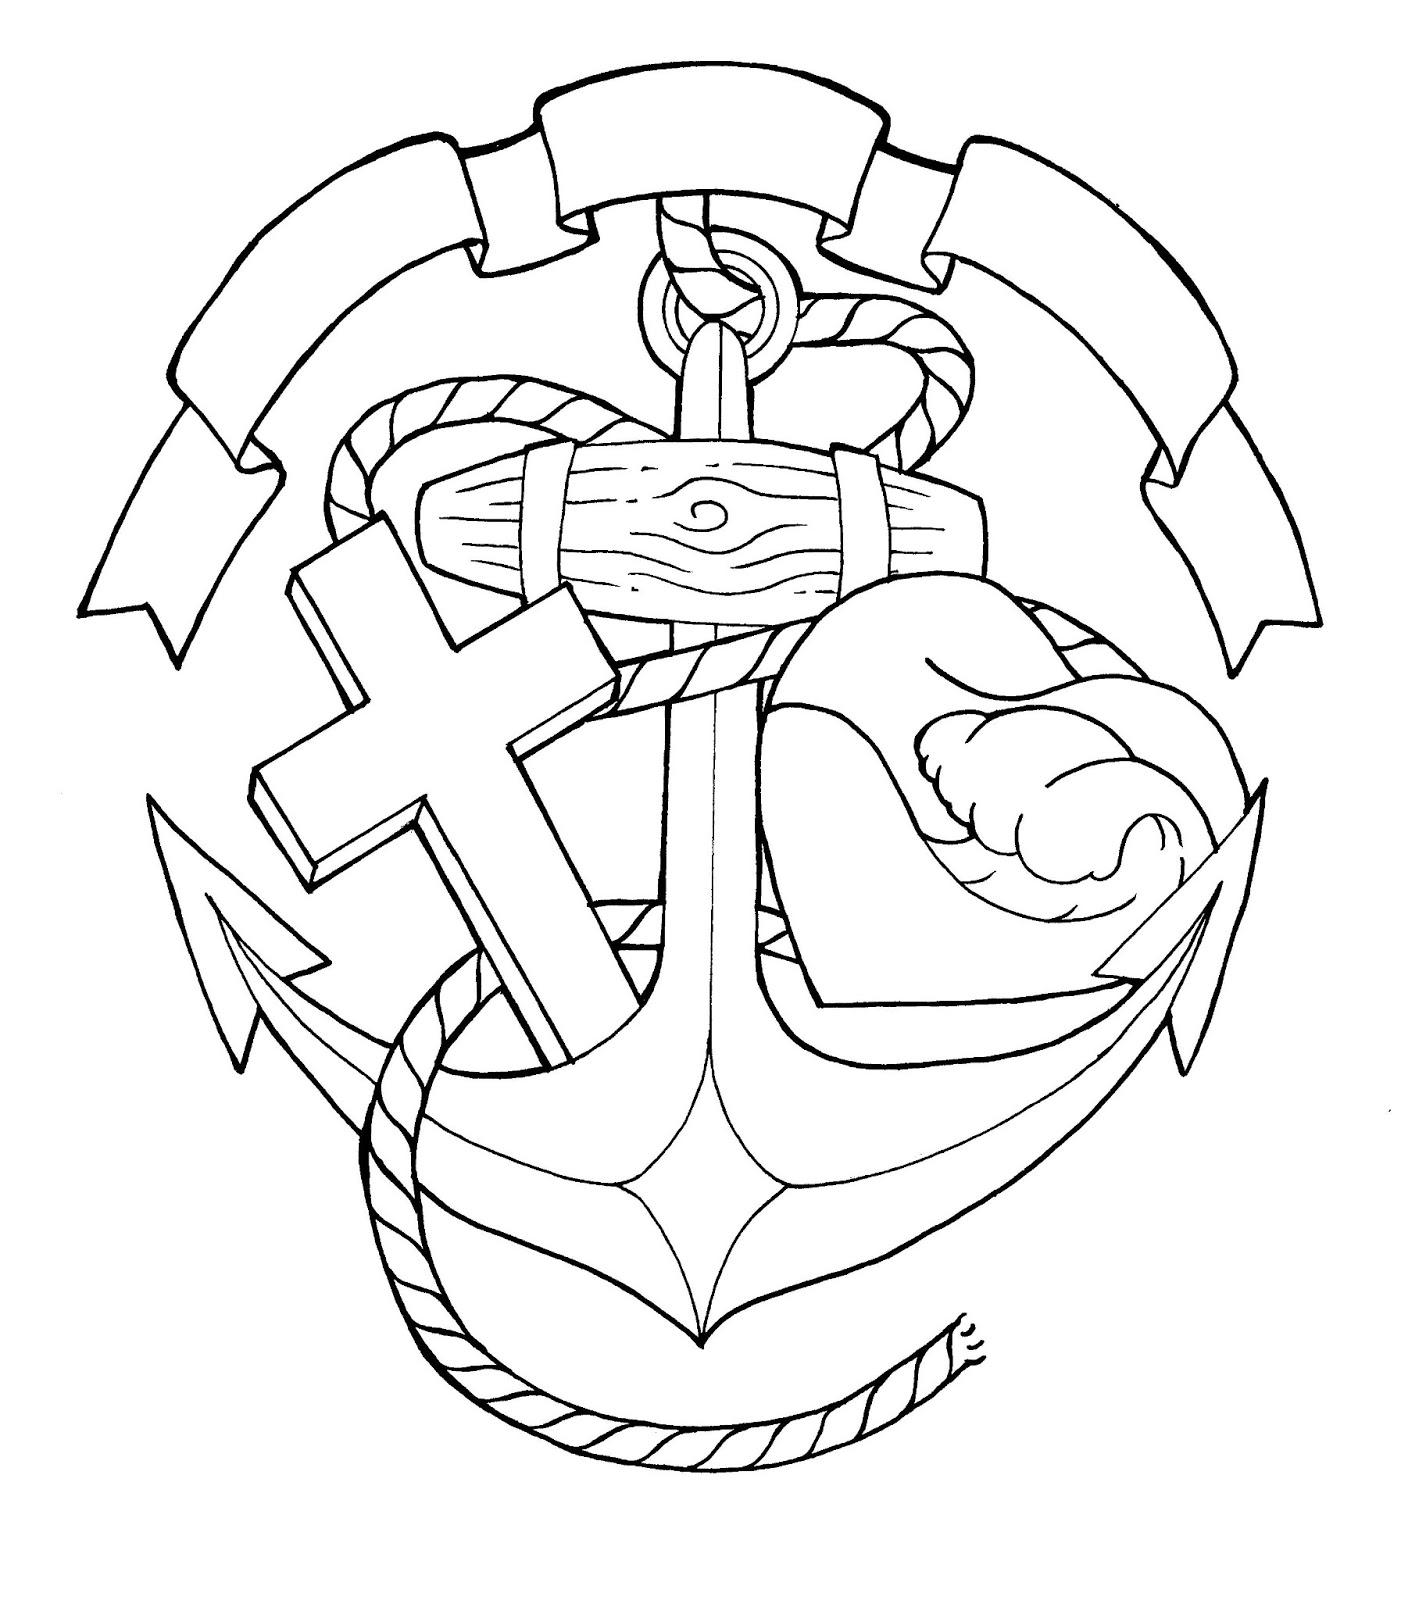 Faith Hope Charity Tattoo Designs Faith hope love tattoo designs